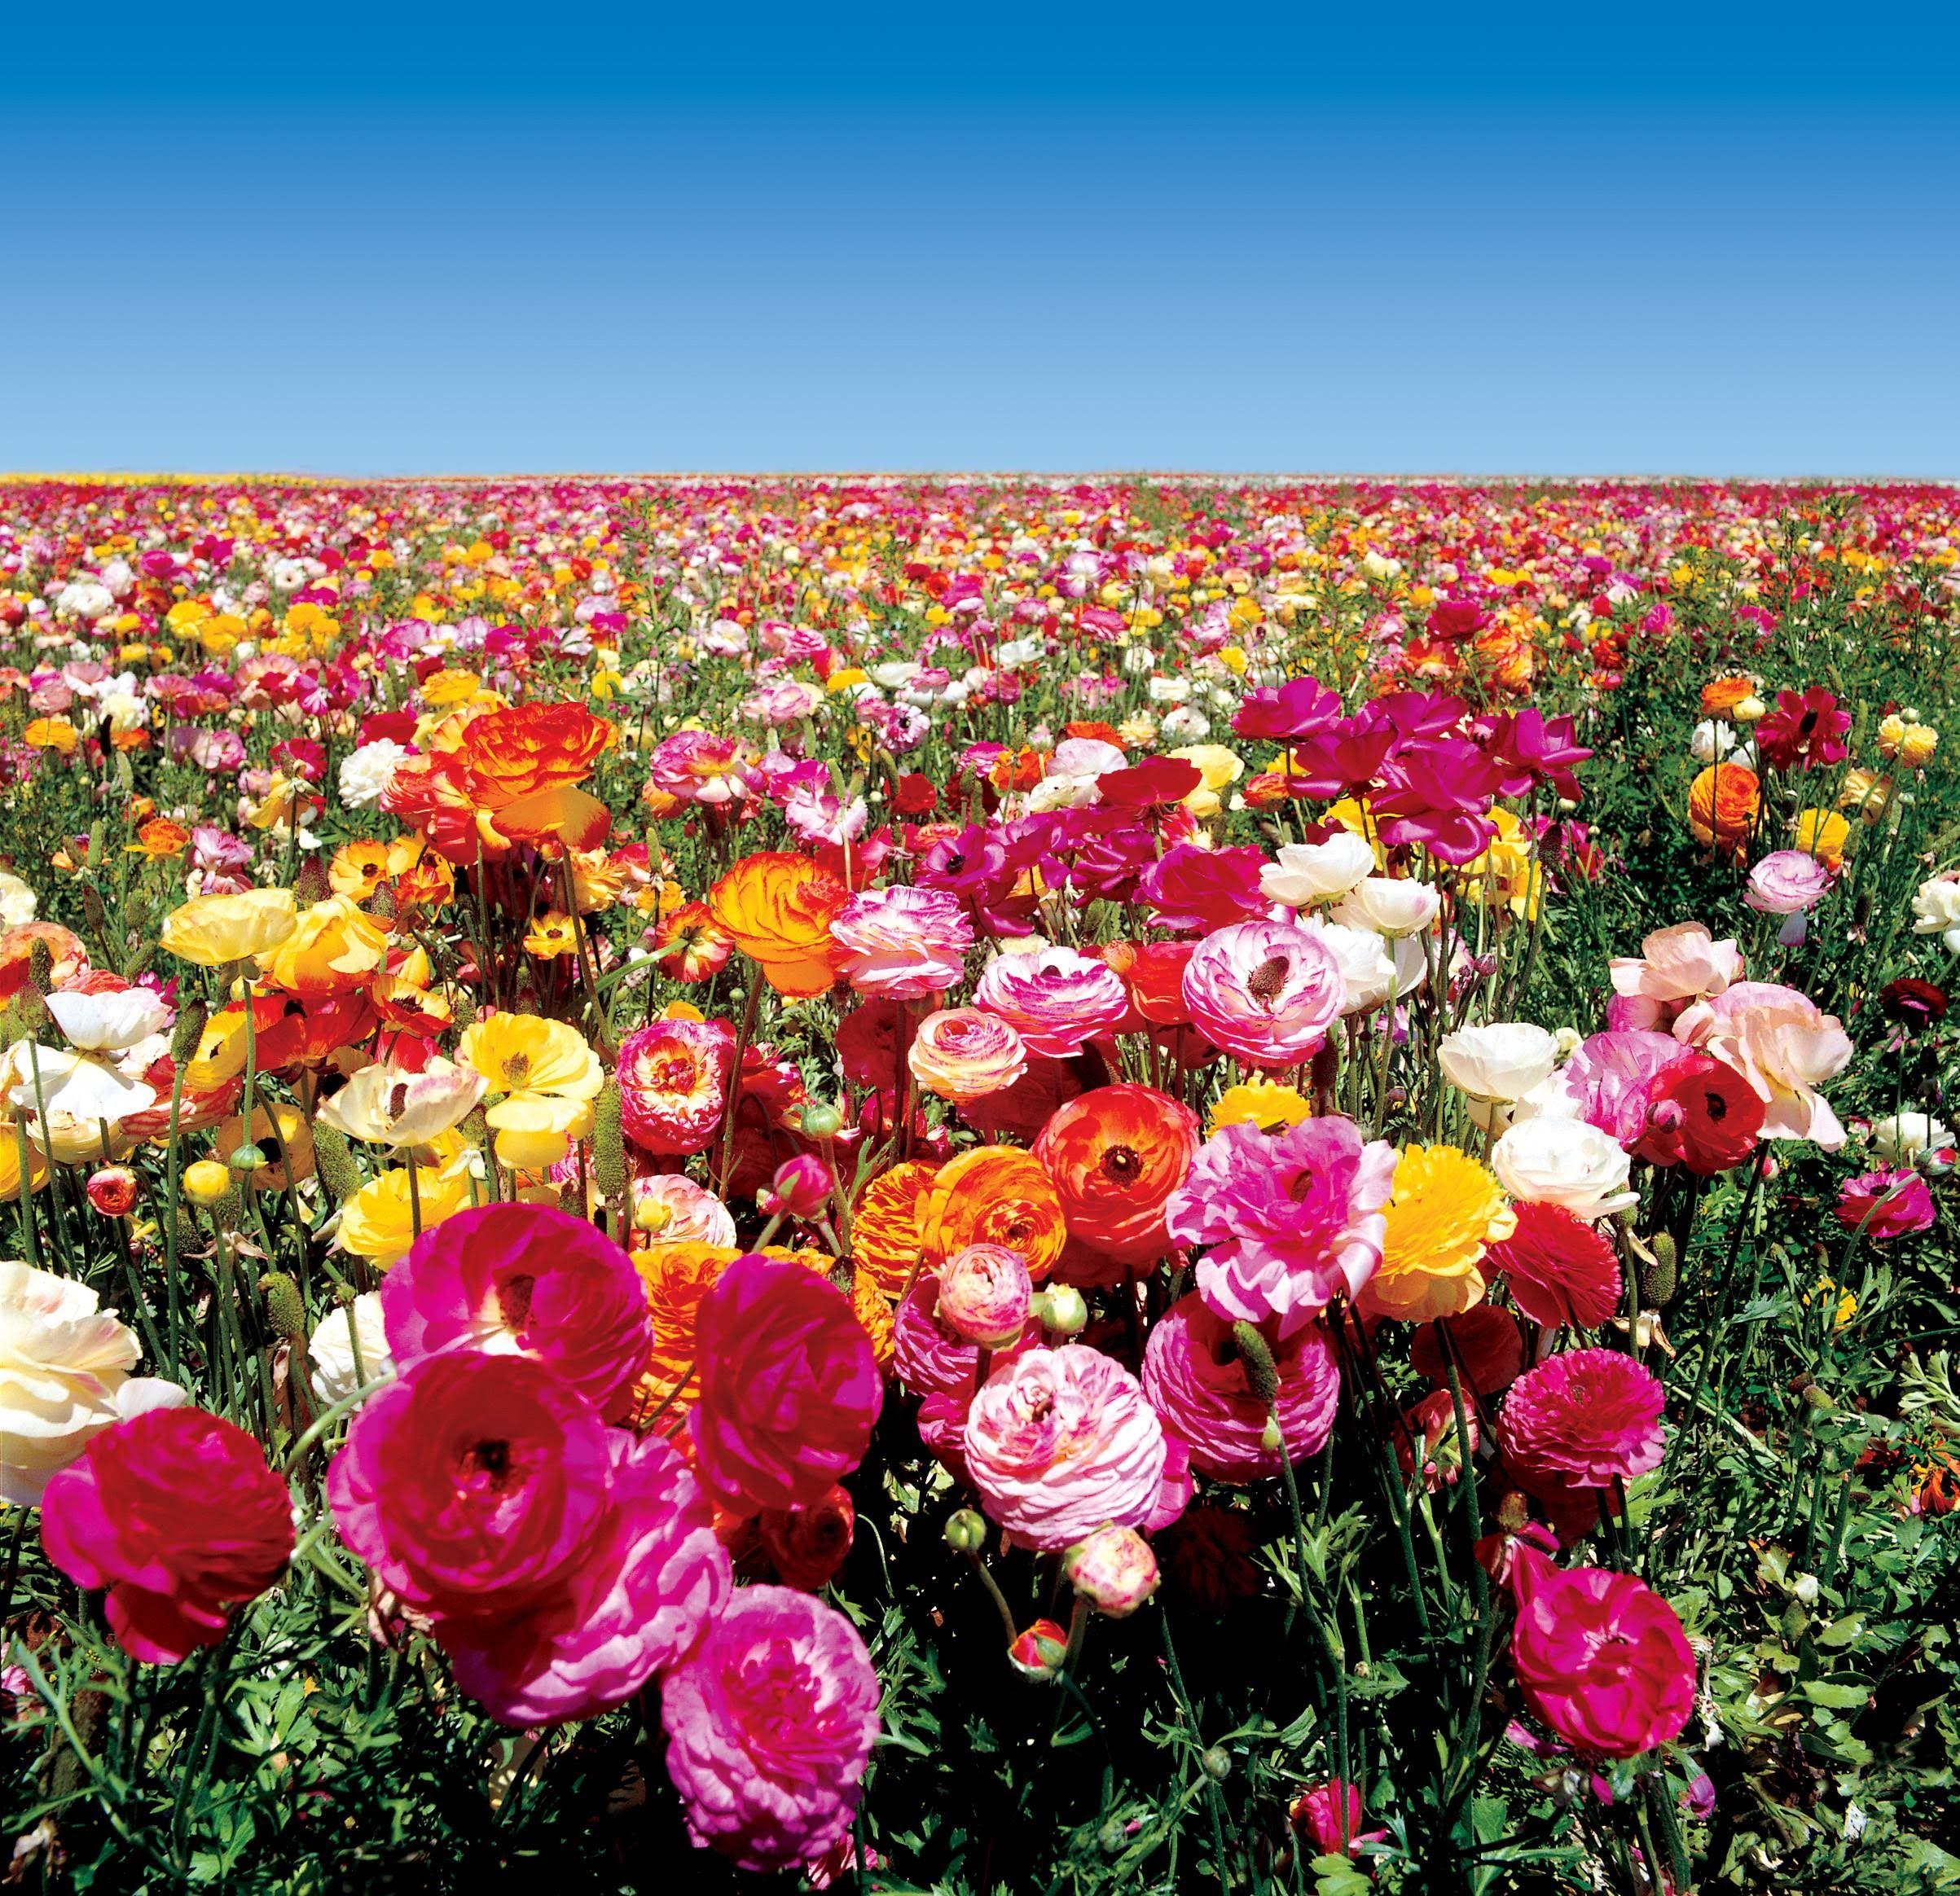 Inbloomgroup Farmfreshflowers Freshflowers Flowers Flower Farmfresh Farmdirectflowers Farmdirect In 2020 Ranunculus Flowers Carlsbad Flower Fields Flower Field